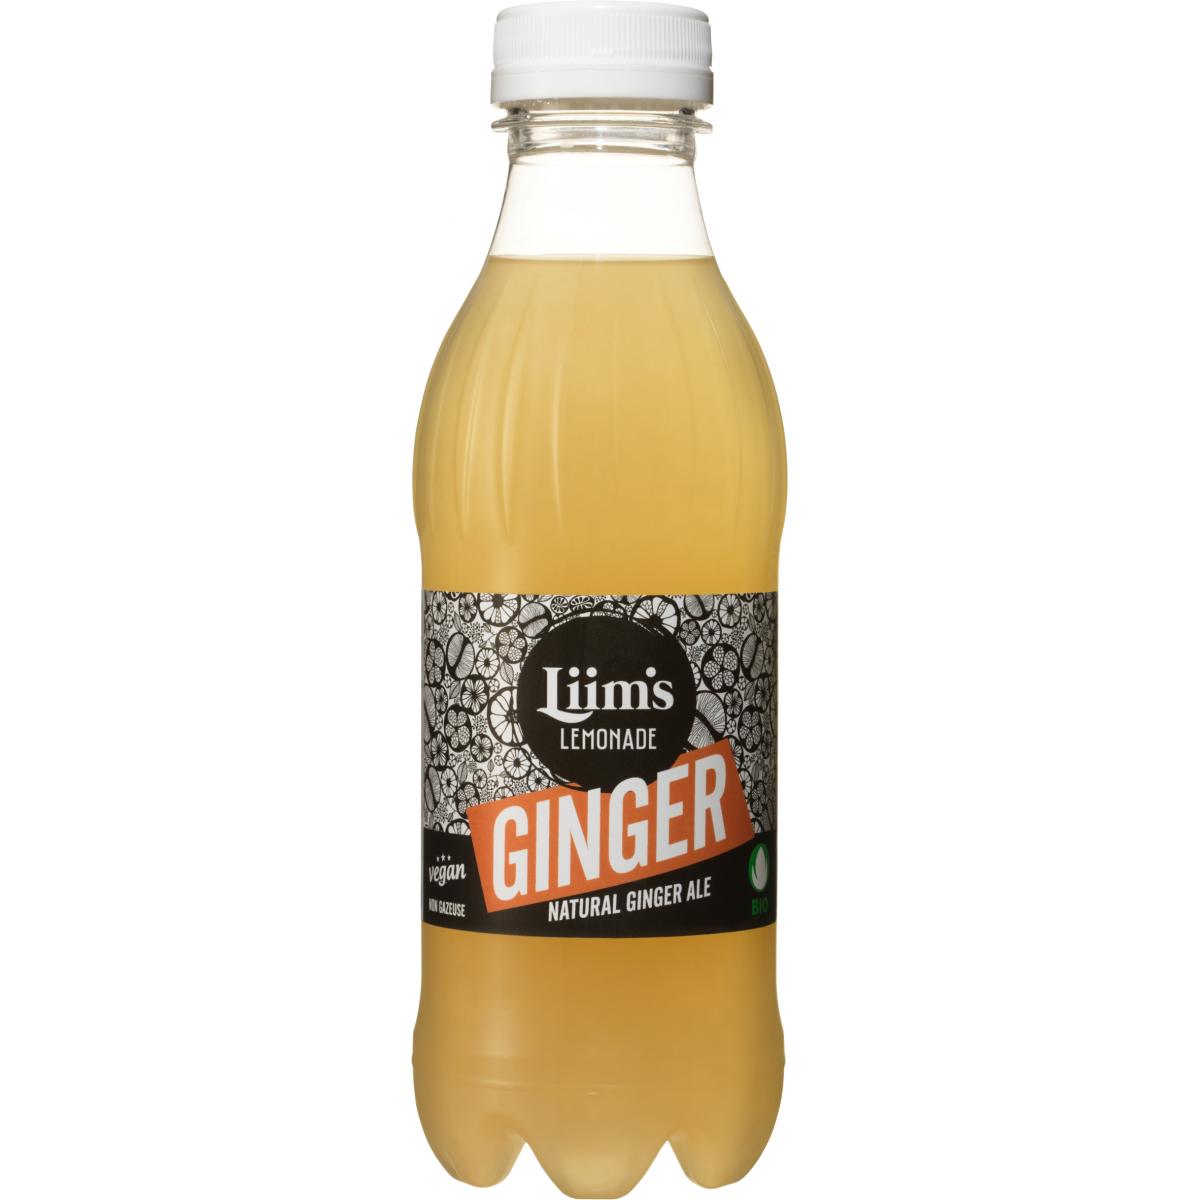 Liim's Ginger Bio-Limonade